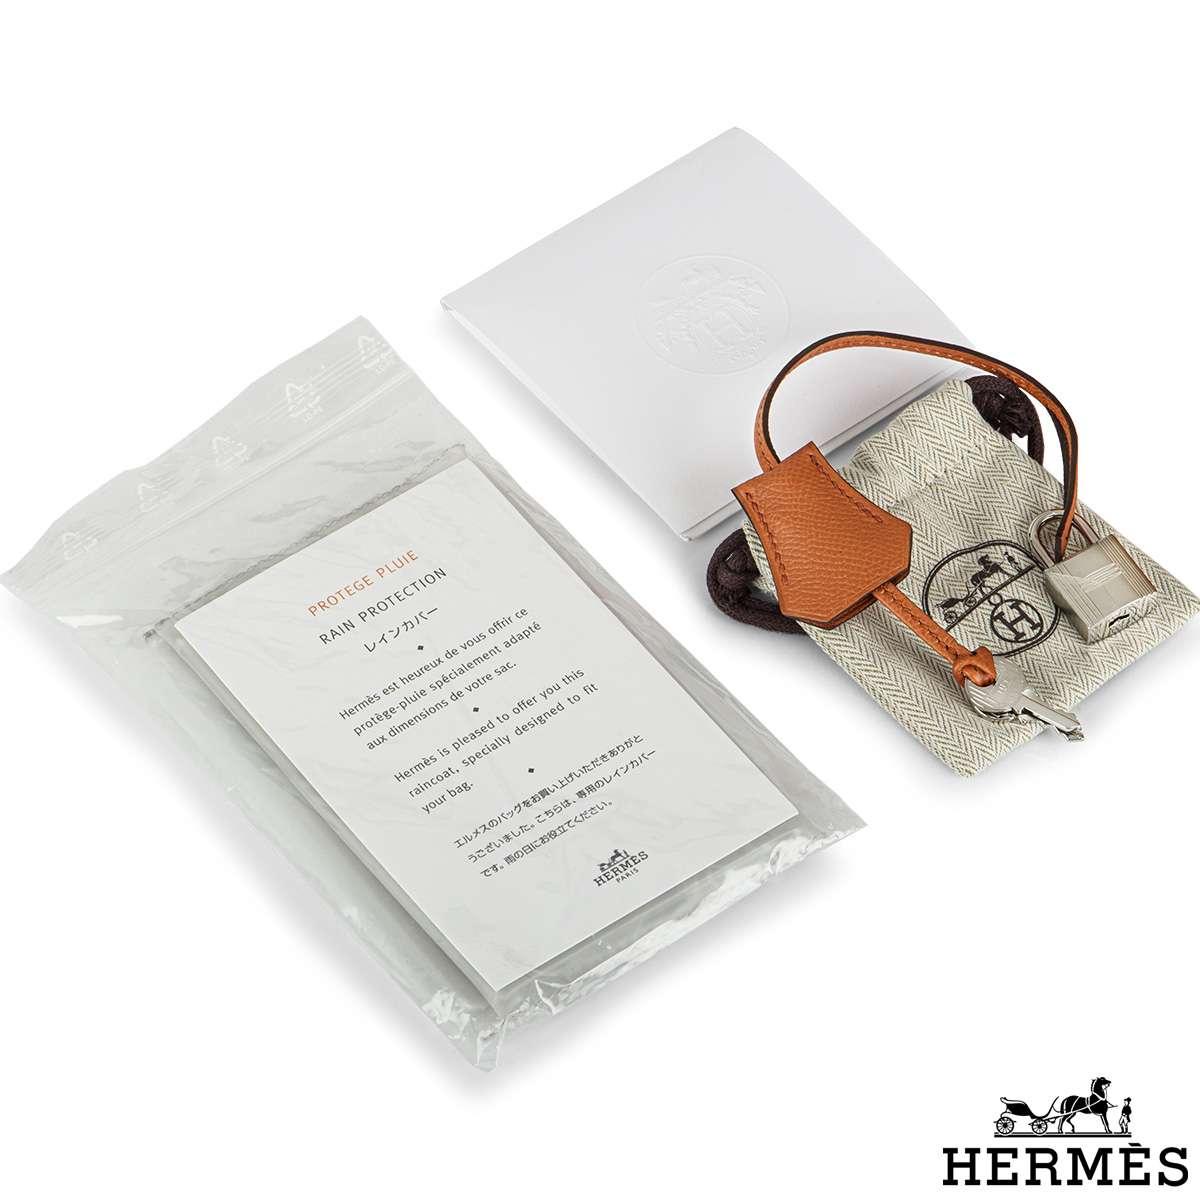 Hermès Birkin 30 Terre Battue Epsom PHW